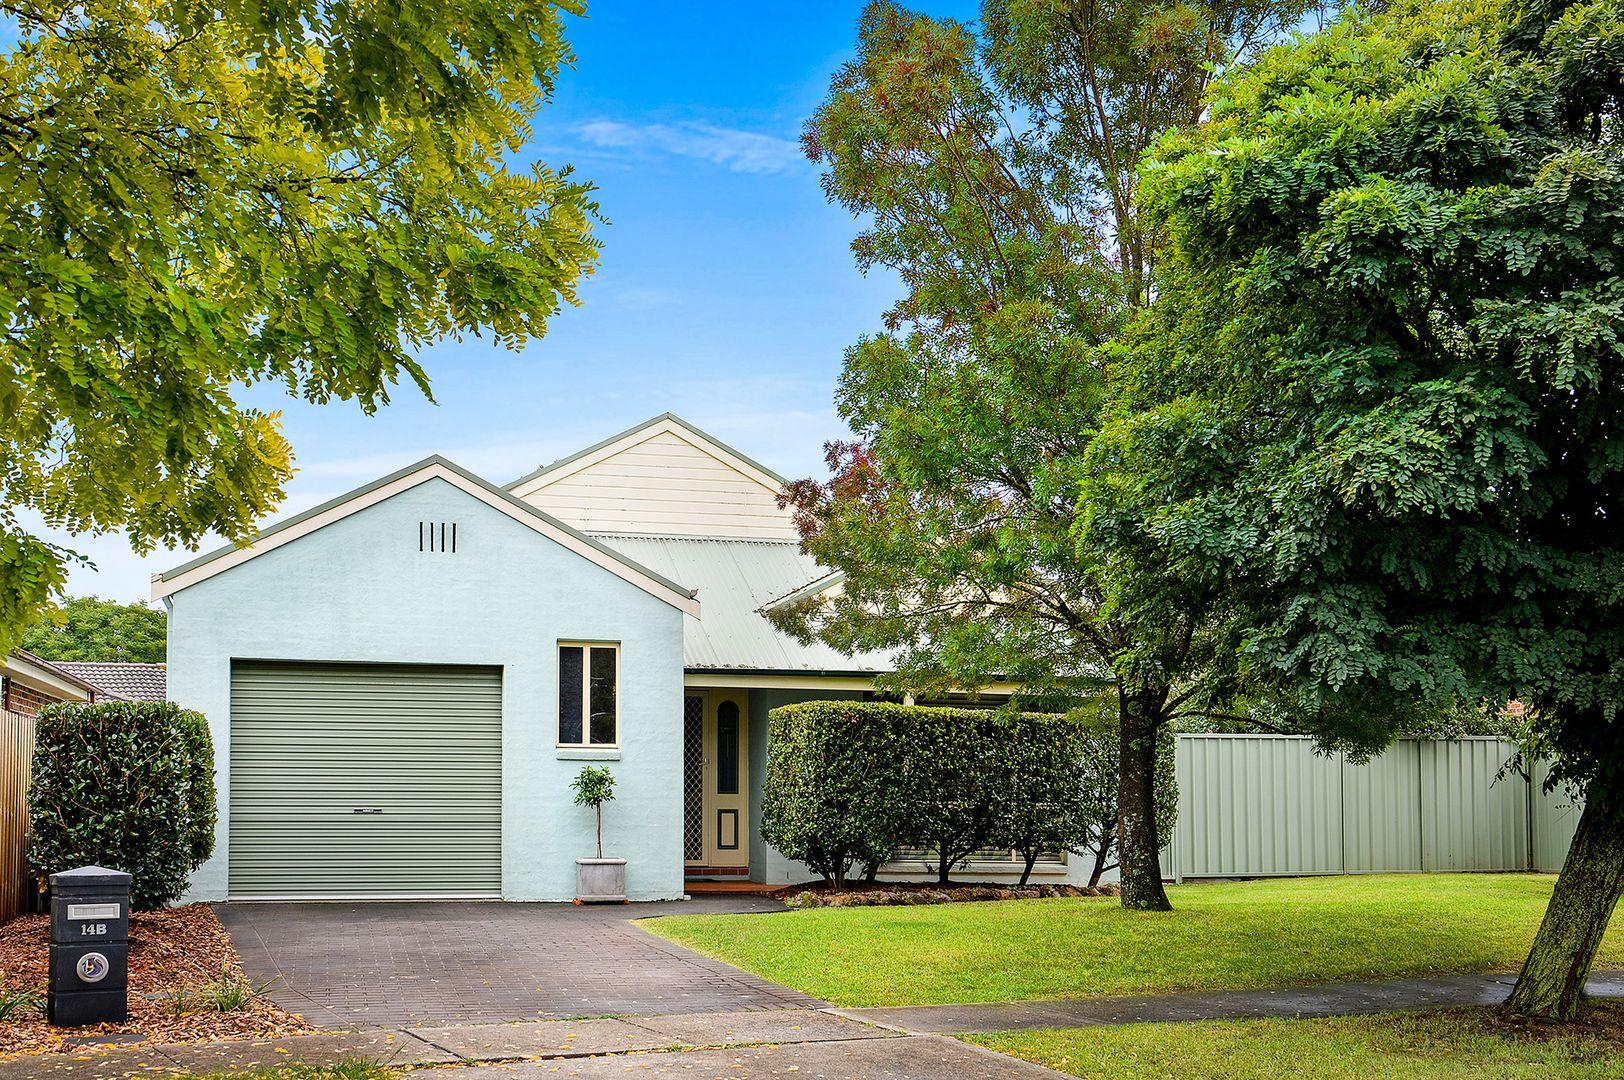 14B Robinia Drive, Bowral NSW 2576, Image 0